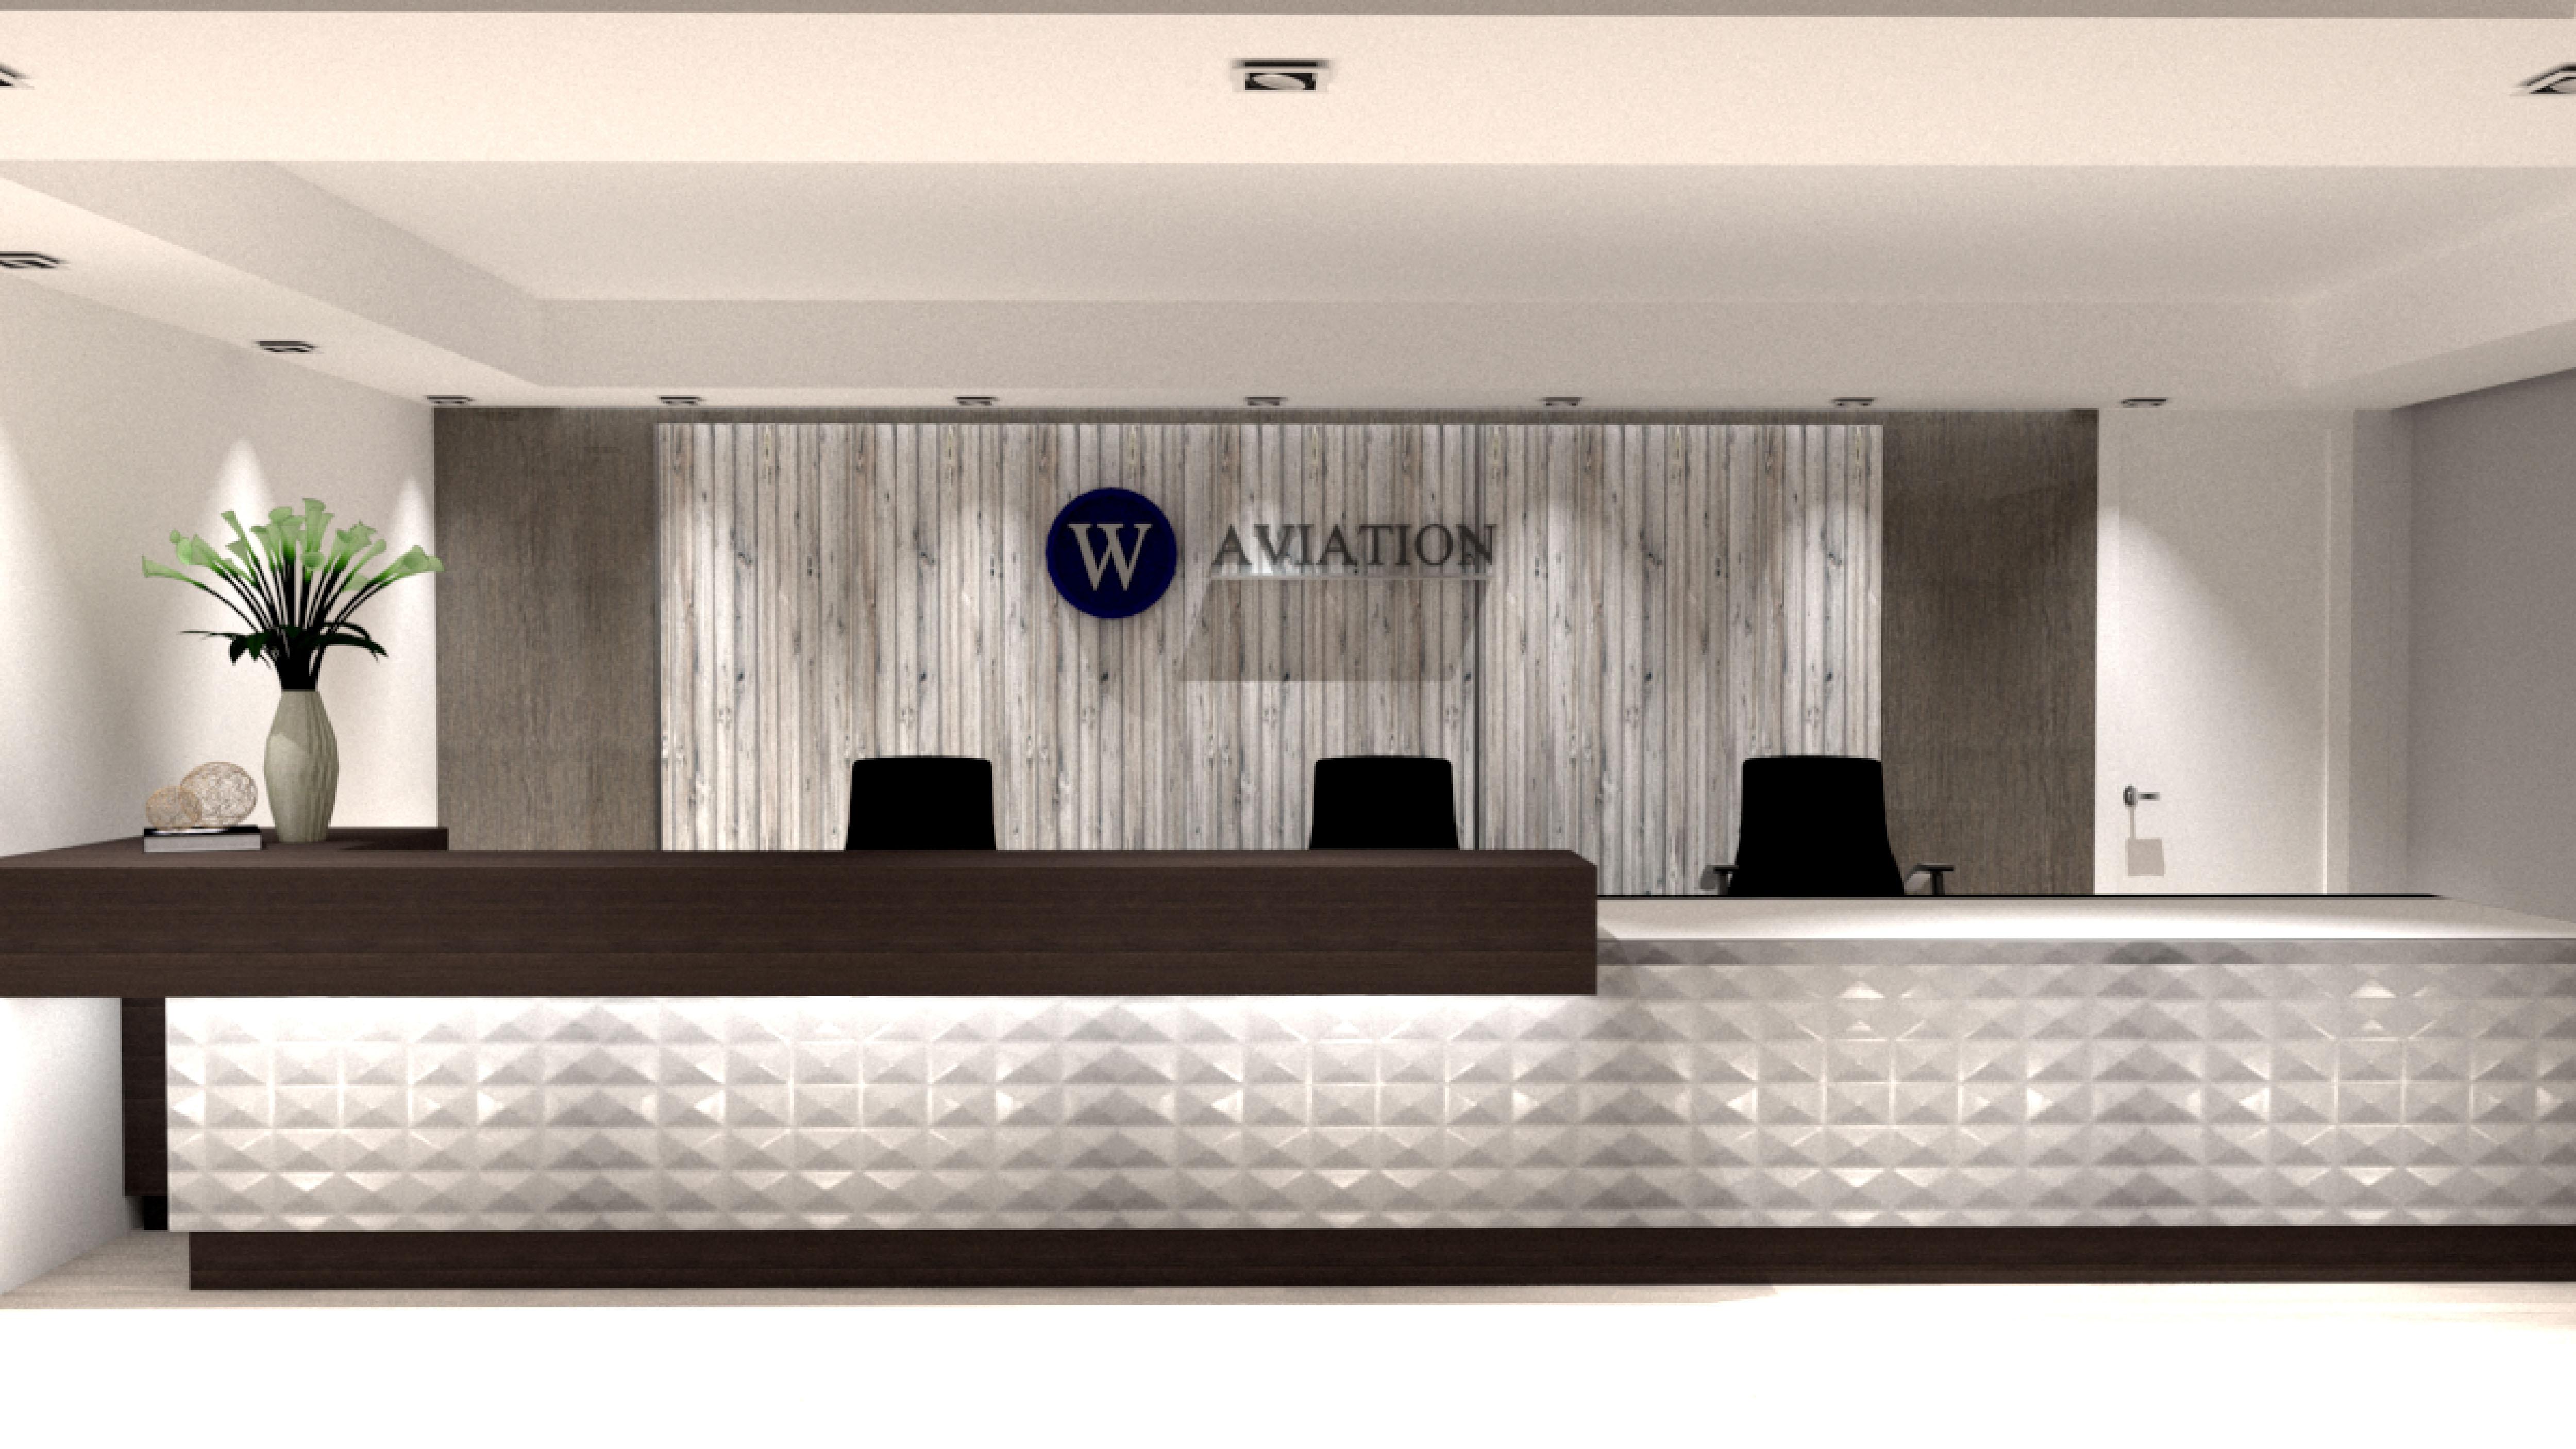 W Aviation Aruba FBO Windsor Group Caribbean